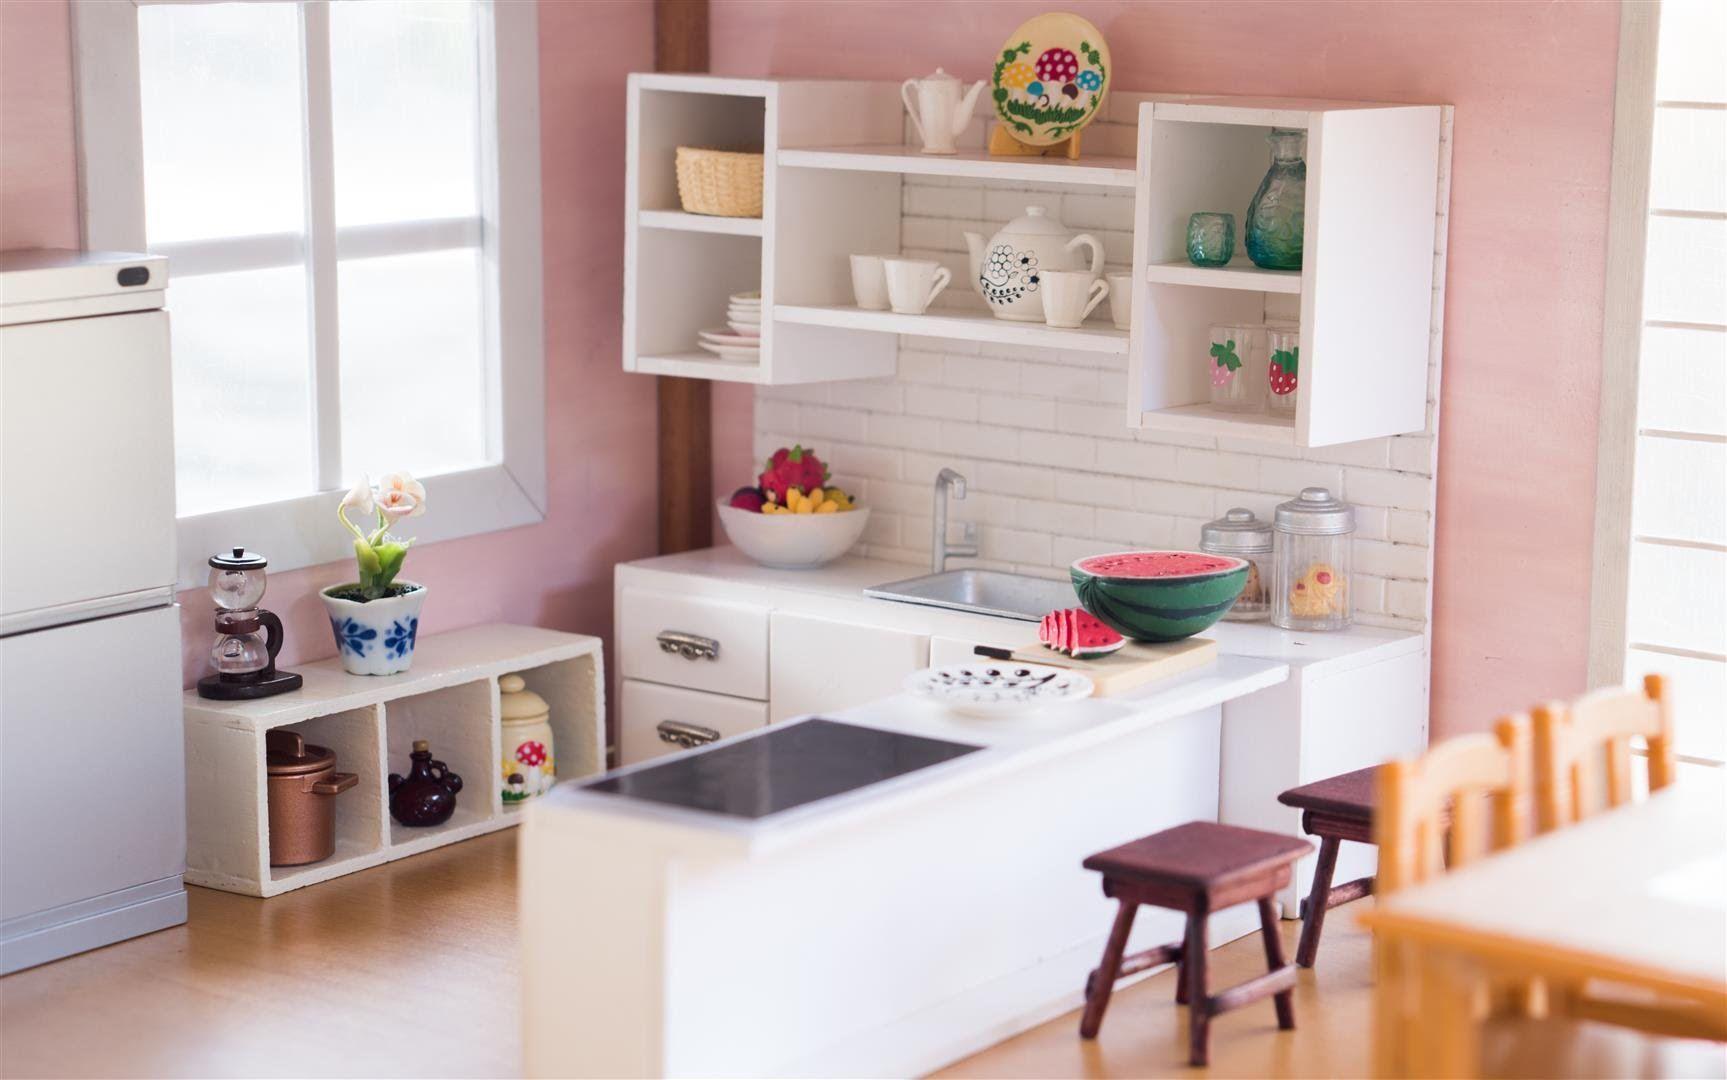 Diy Dollhouse Miniature Kitchen For Nendoroid Dolls Action Figures Miniatures